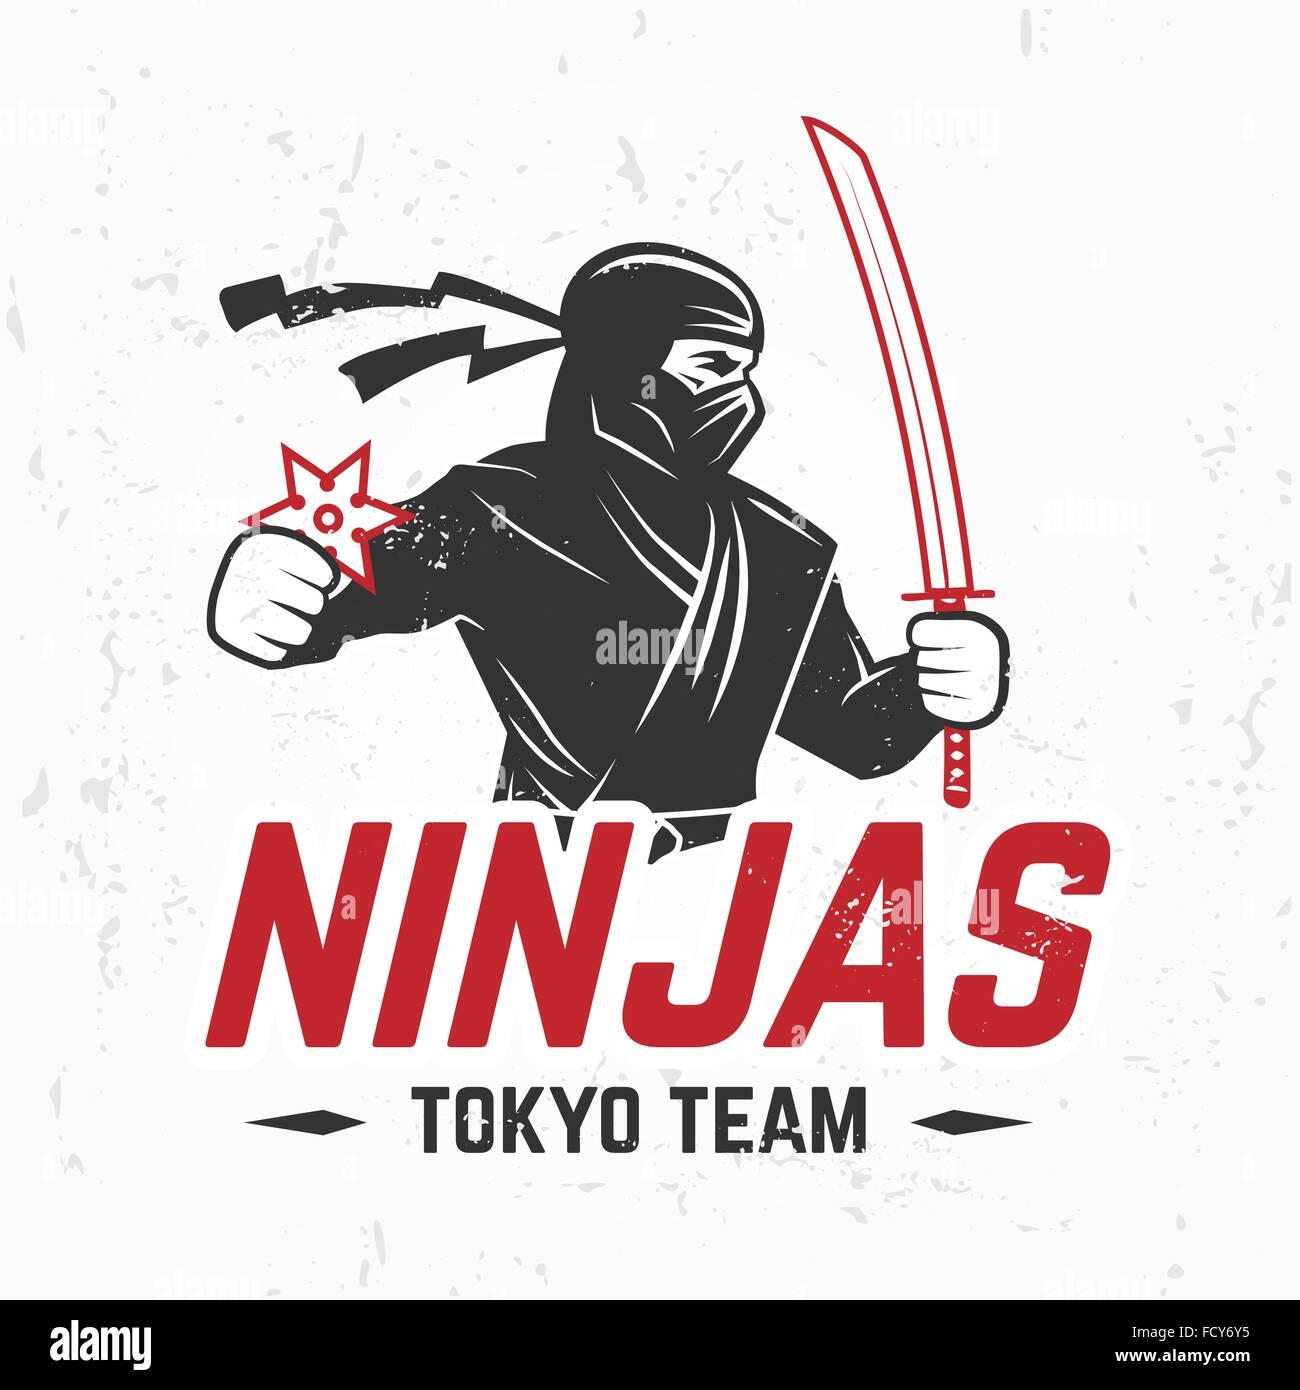 Design shirt japan - Japan Ninjas Sport Logo Concept Katana Weapon Insignia Design Vintage Ninja Mascot Badge Martial Art Team T Shirt Illustration